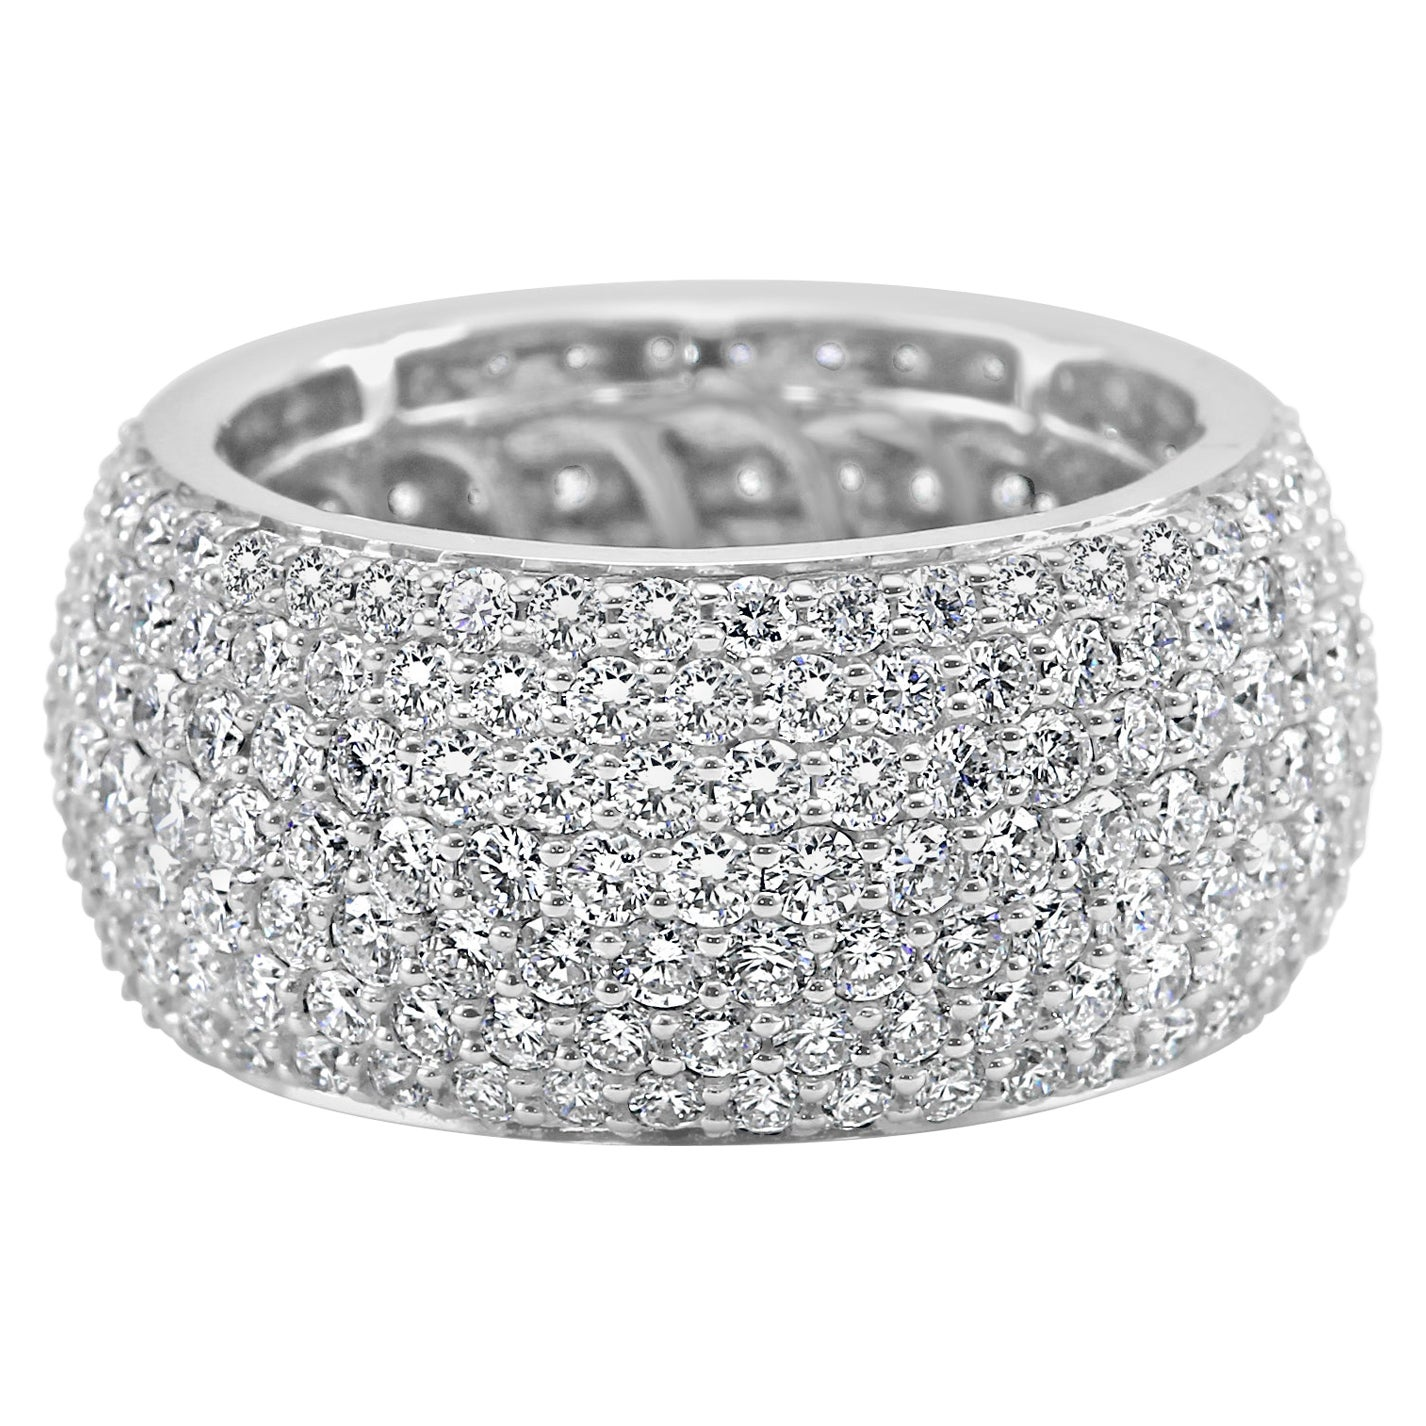 7-Row White Round Diamond 18K Gold Fashion Cocktail Dome Eternity Band Ring